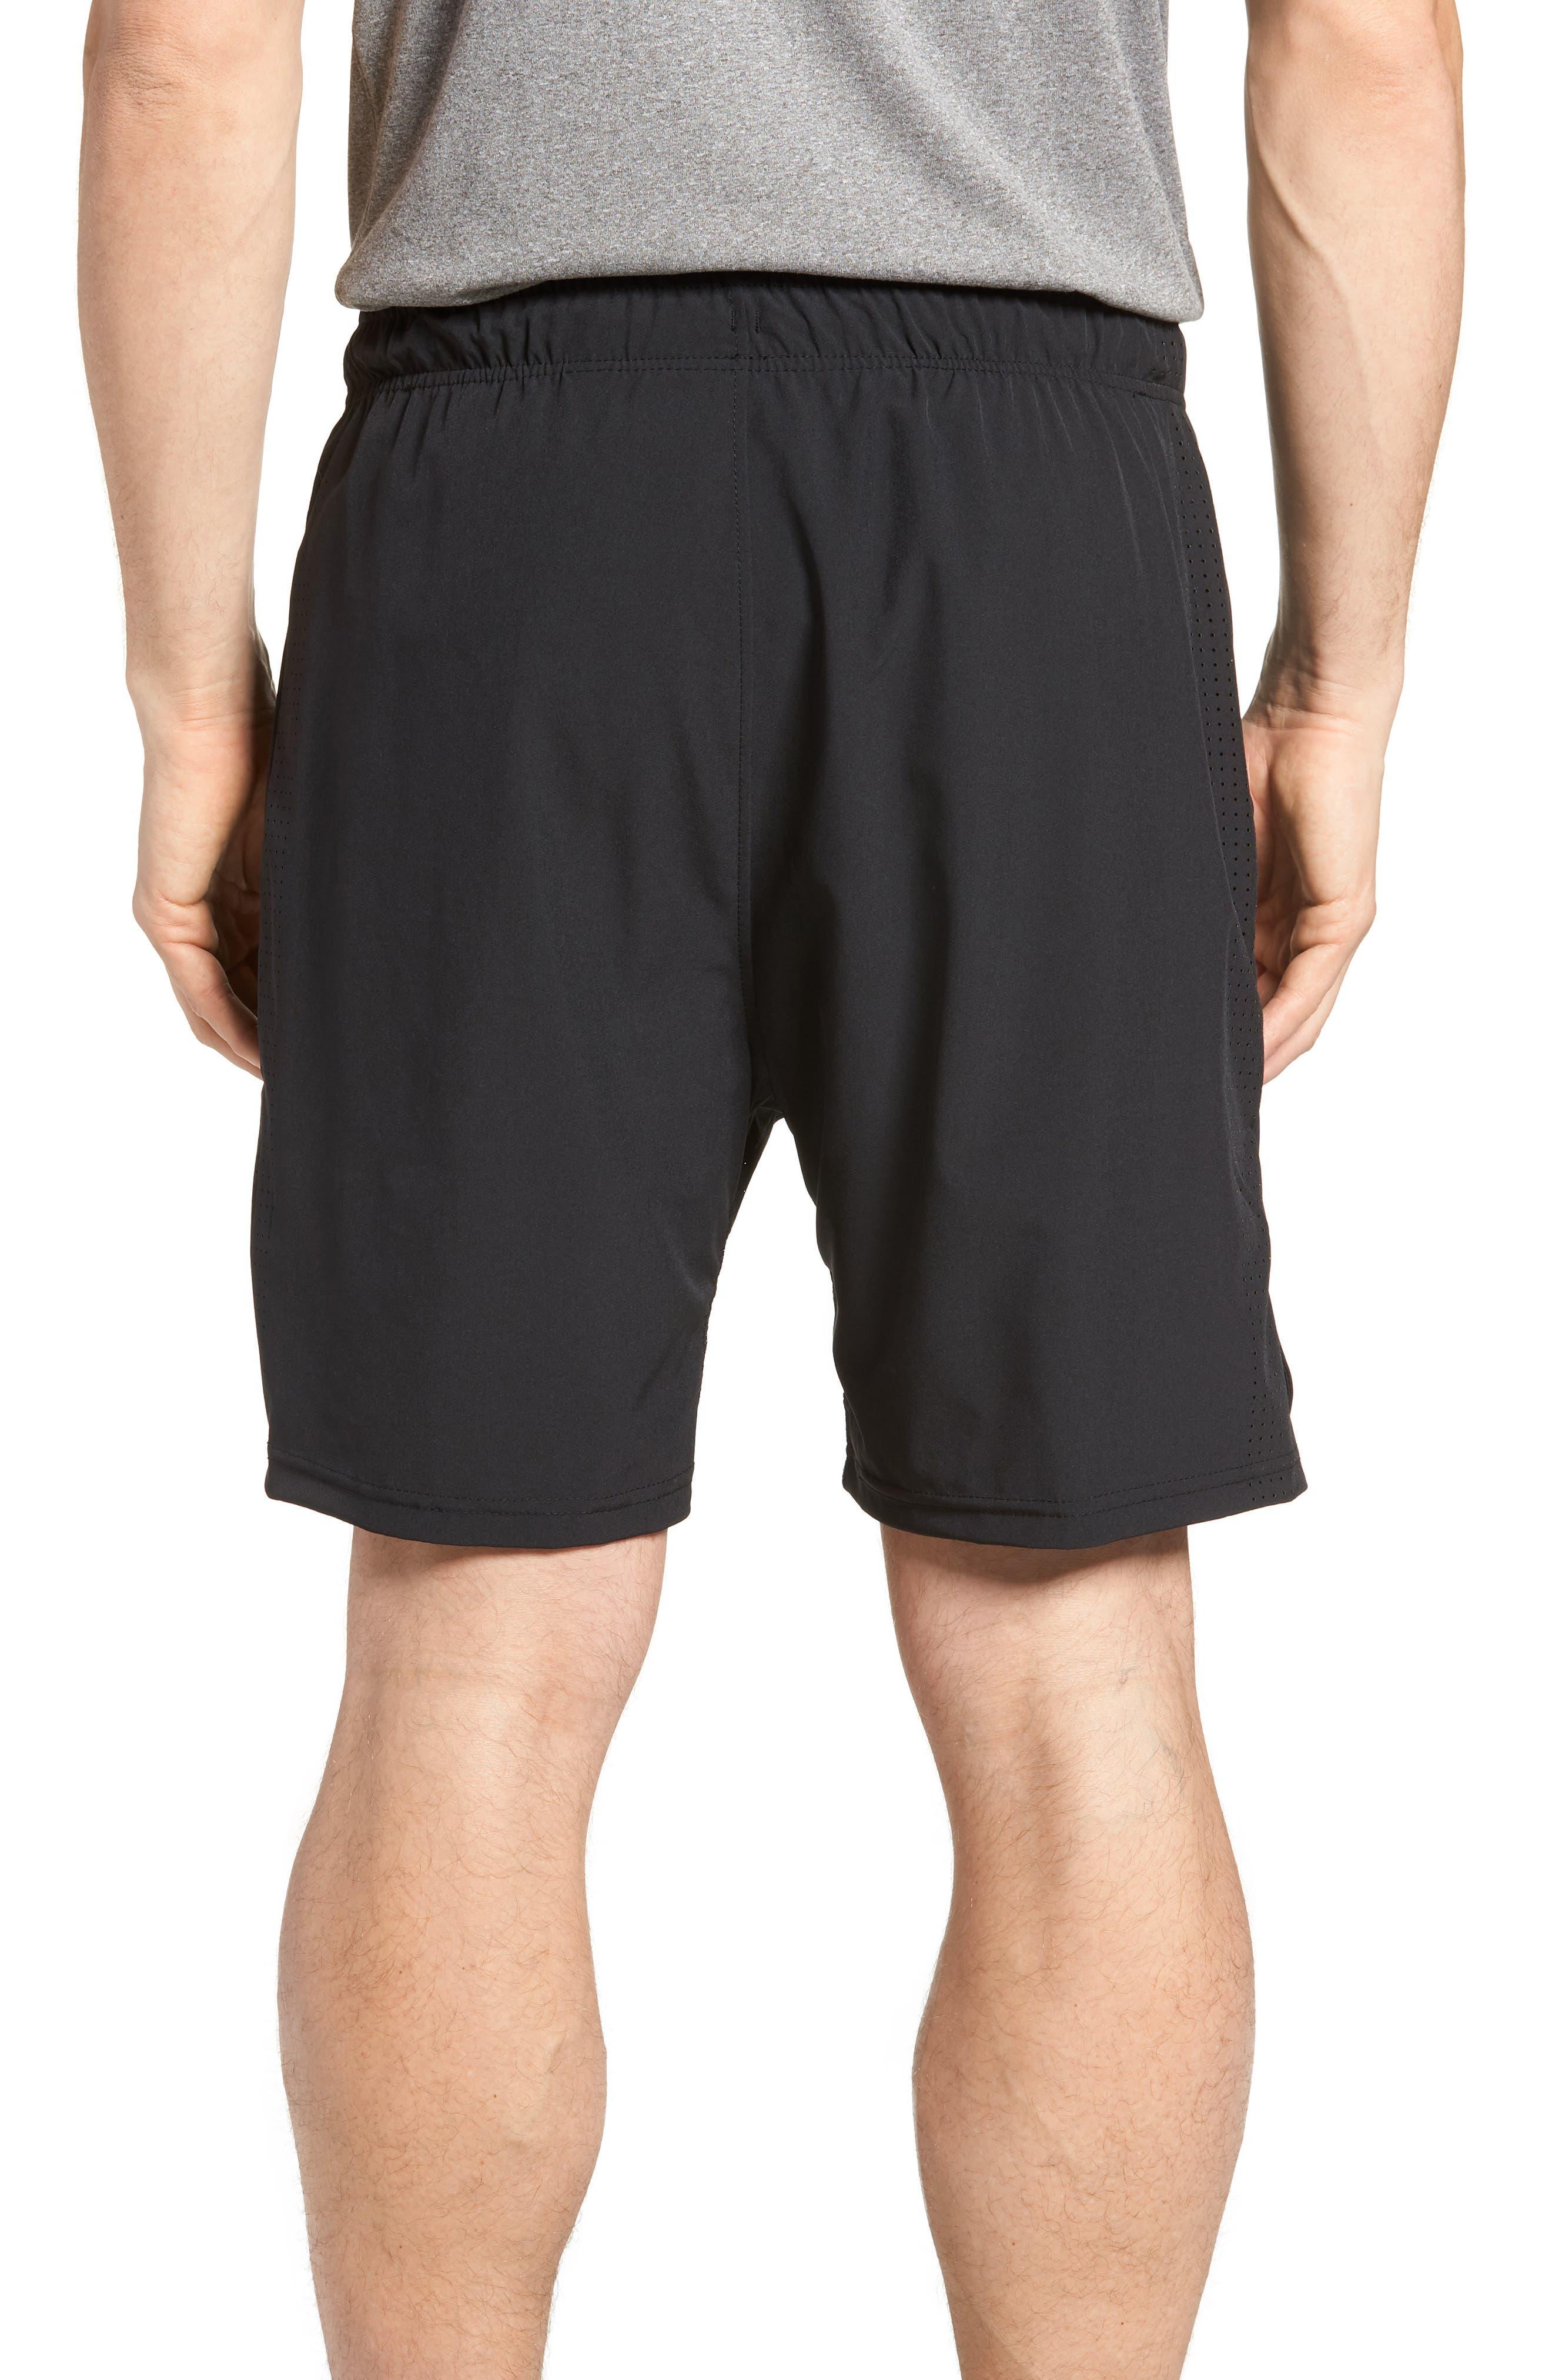 ZANEROBE Type 3 Tech Shorts,                             Alternate thumbnail 2, color,                             001